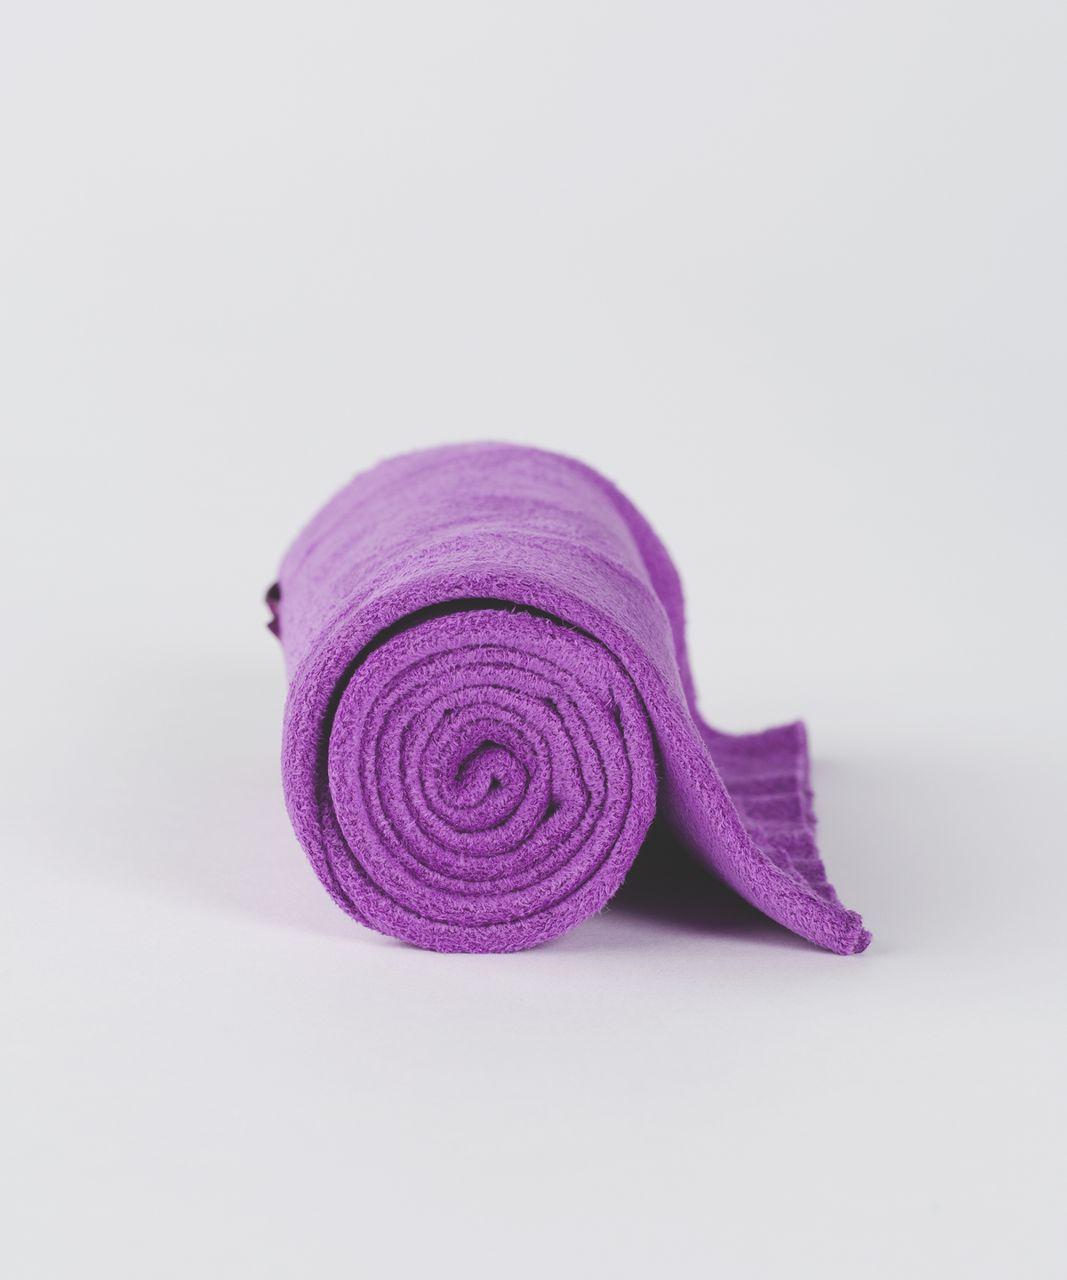 Lululemon The (Small) Towel - Moonlit Magenta